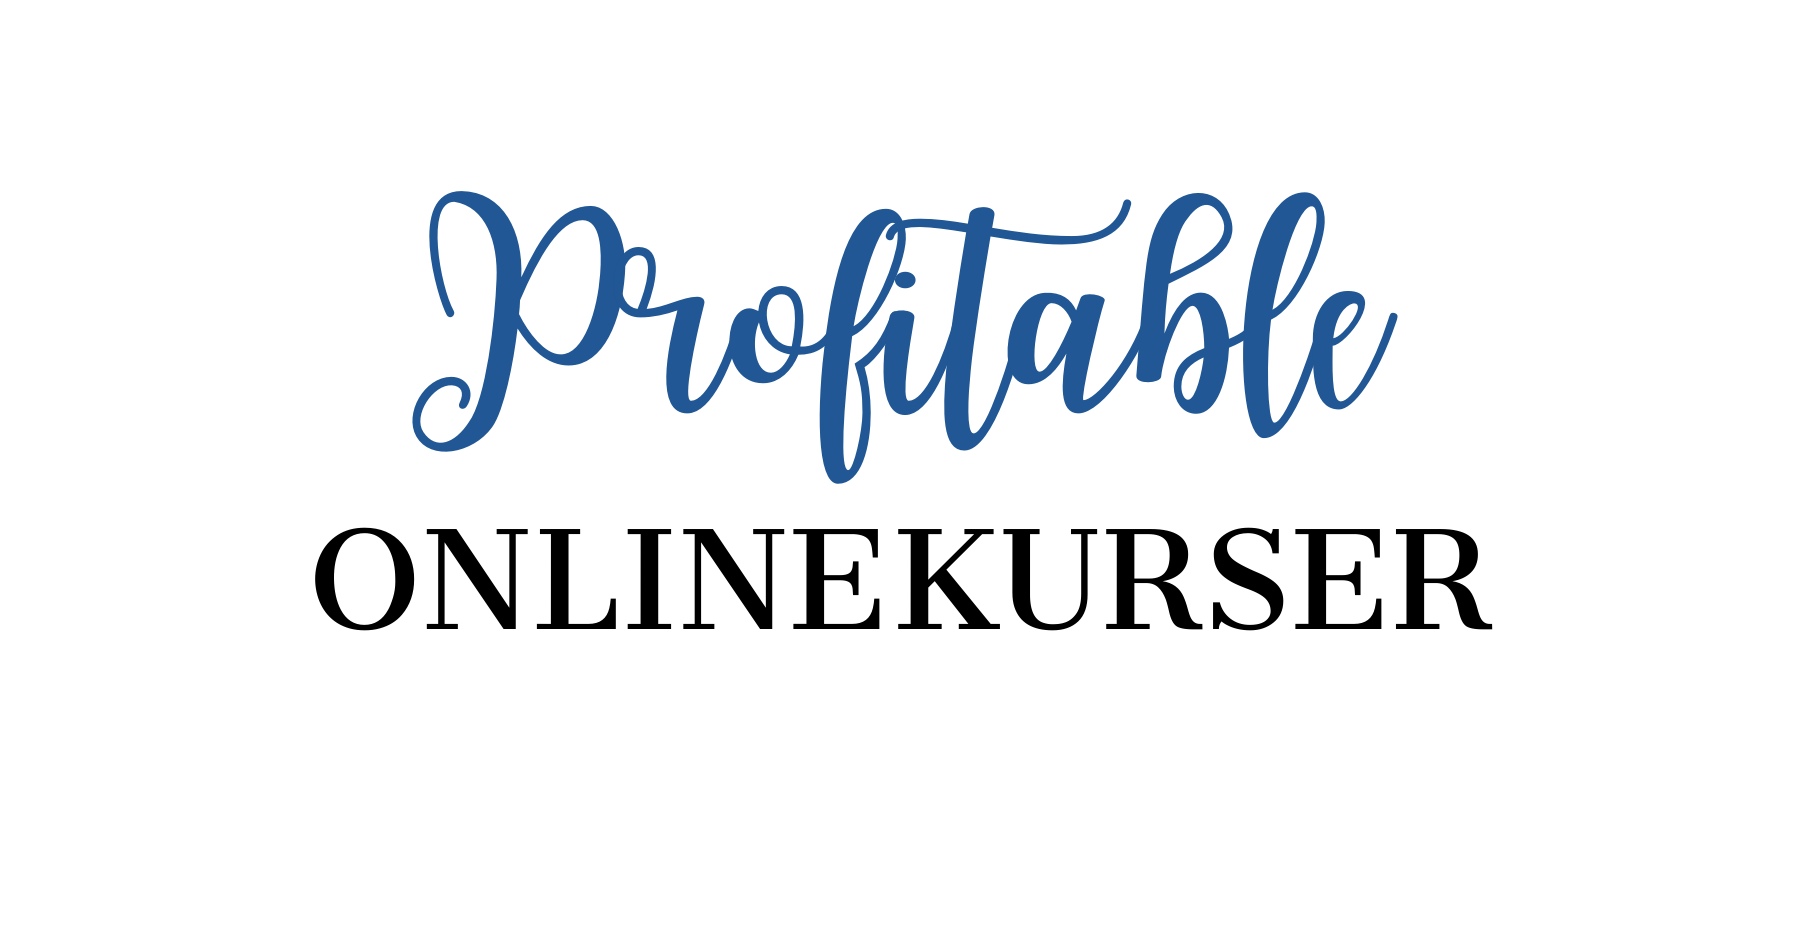 Profitable Onlinekurser